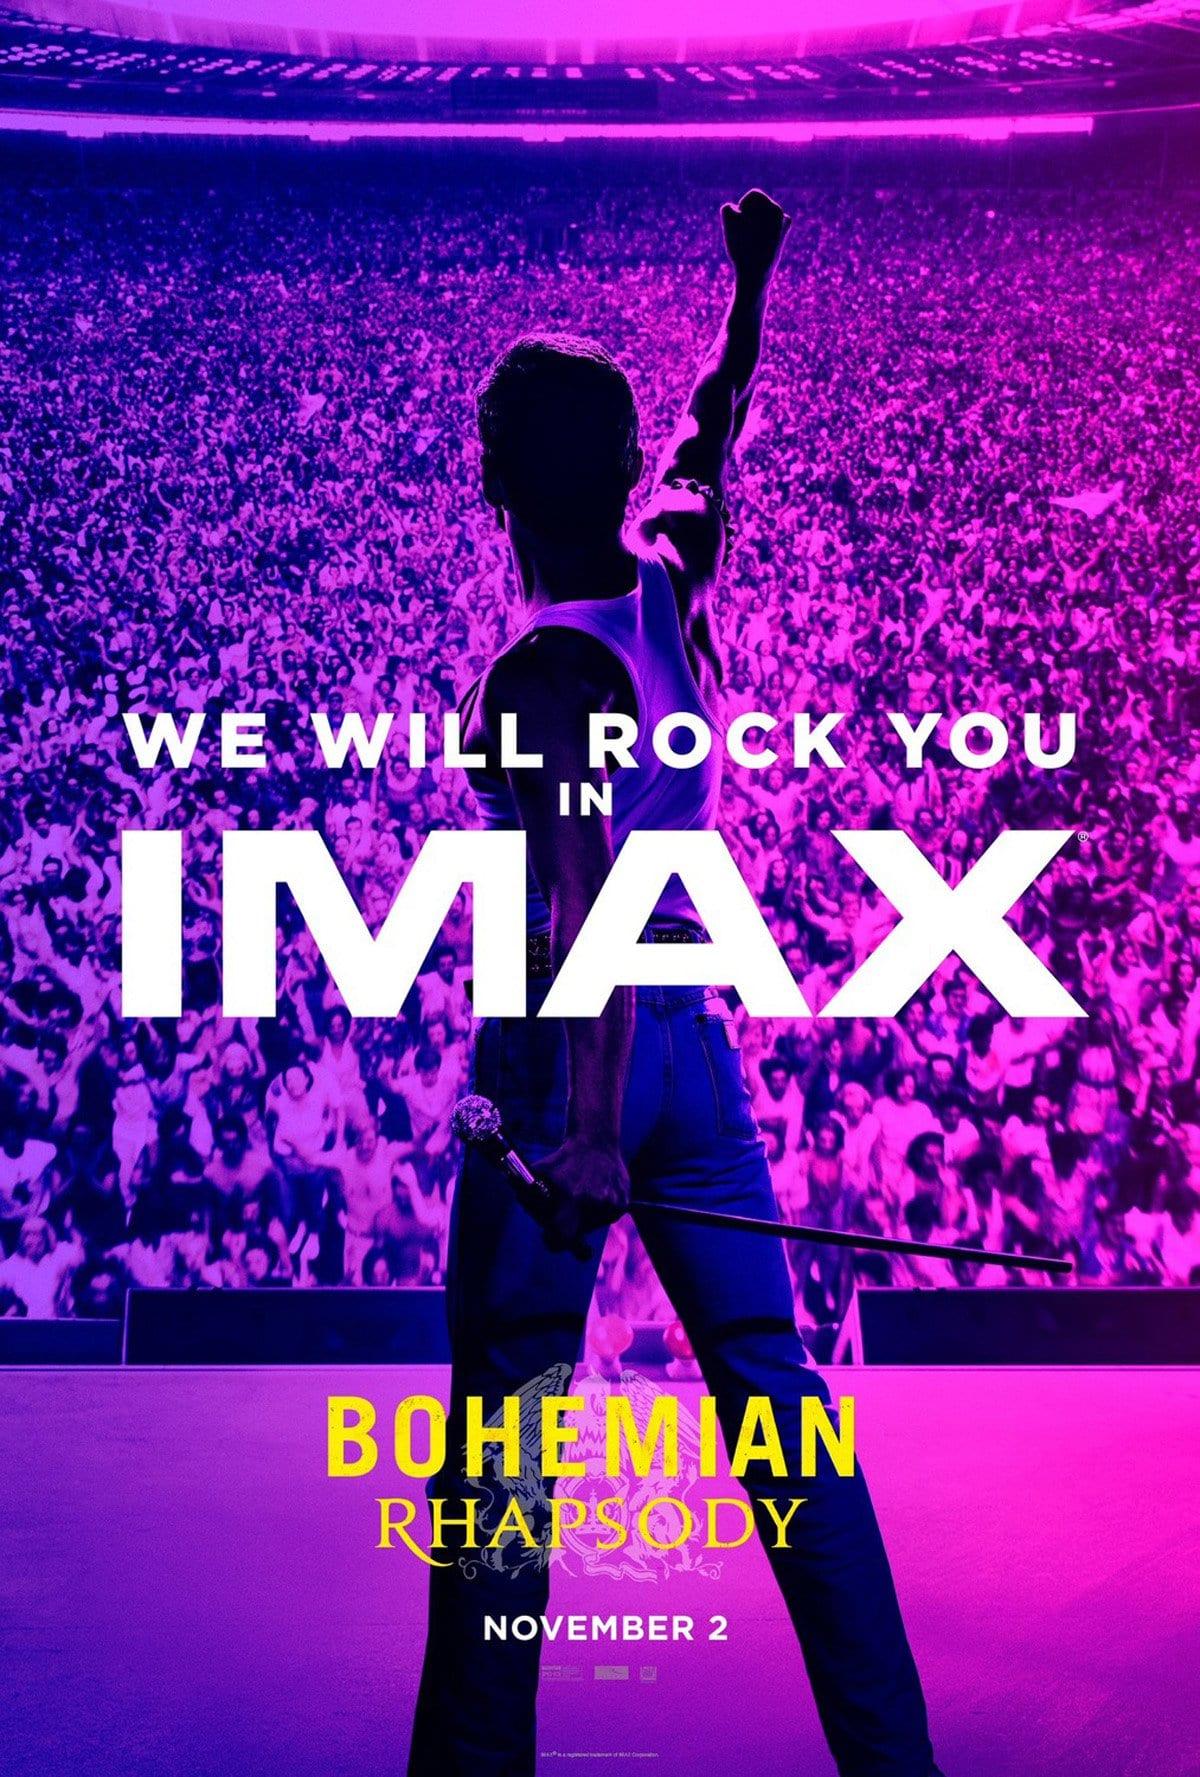 Streaming Bohemian Rhapsody Reddit : streaming, bohemian, rhapsody, reddit, Poster, 'Bohemian, Rhapsody', Movies